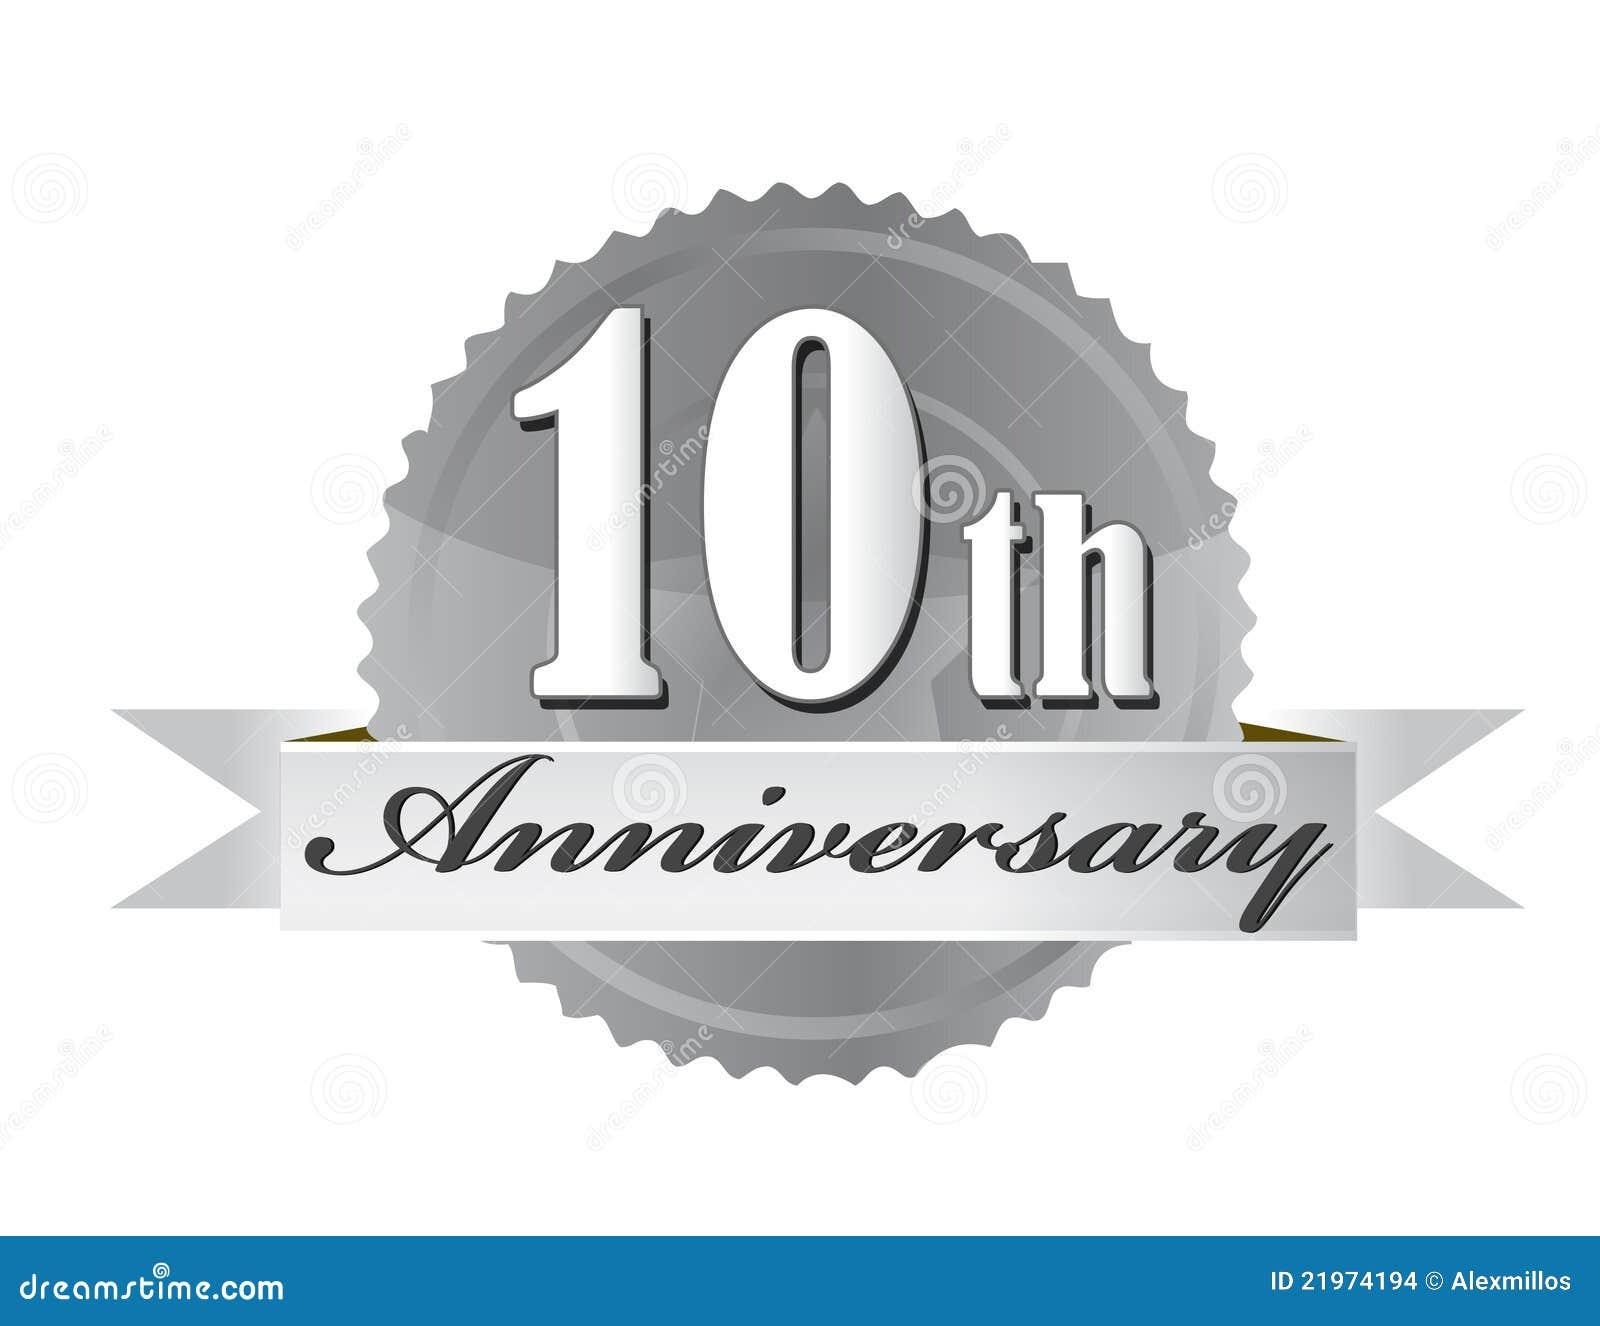 10th Anniversary Seal Illustration Design Stock Vector